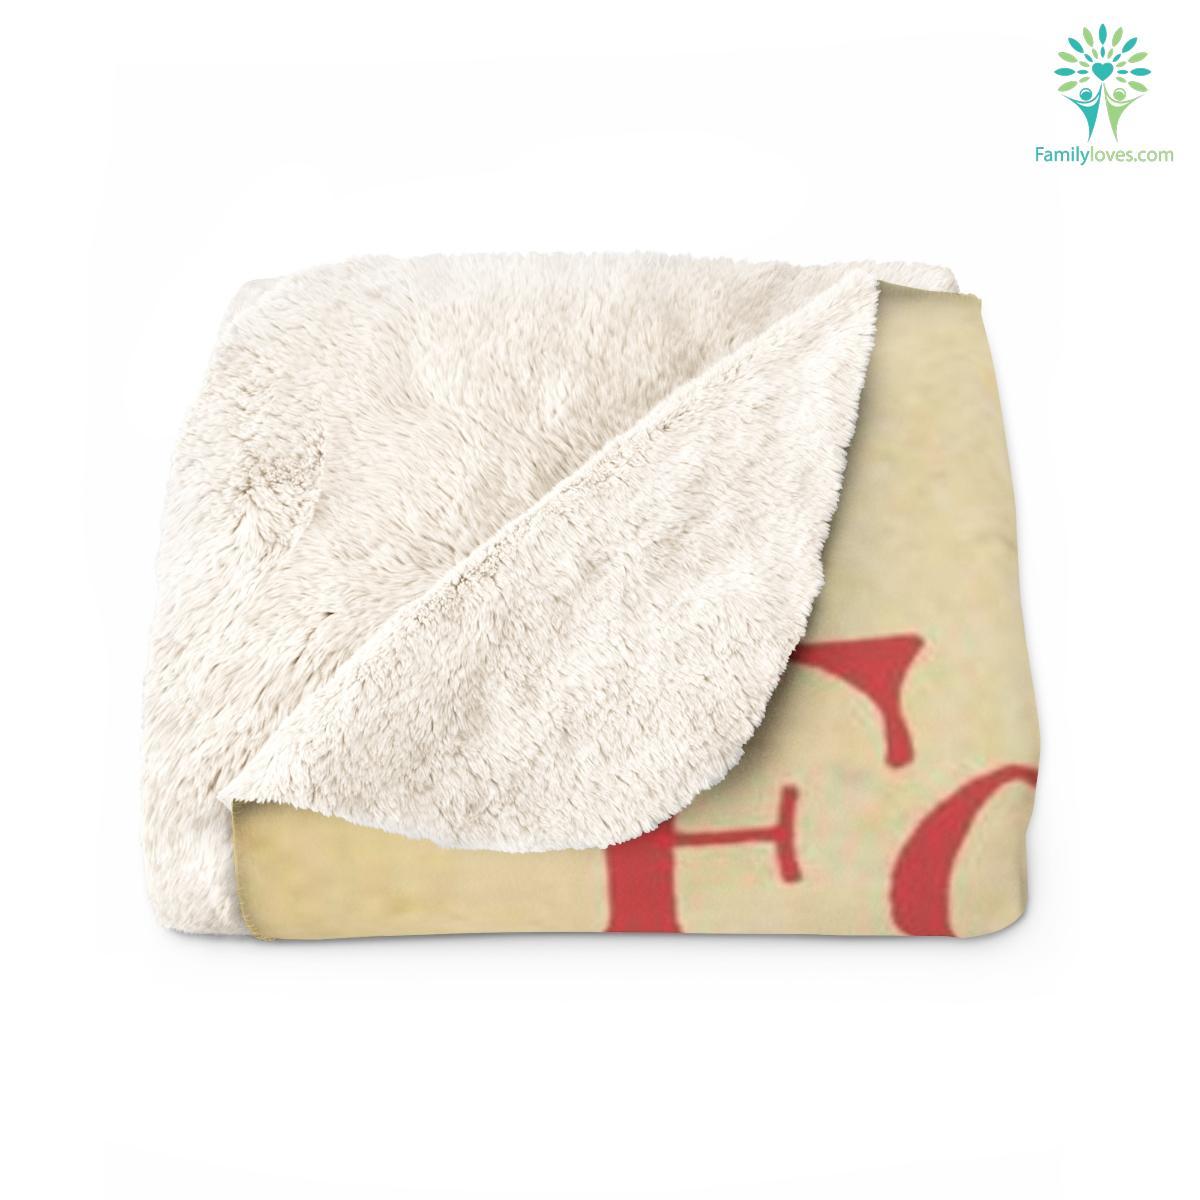 Love For My Son Quotes Sherpa Fleece Blanket Familyloves.com